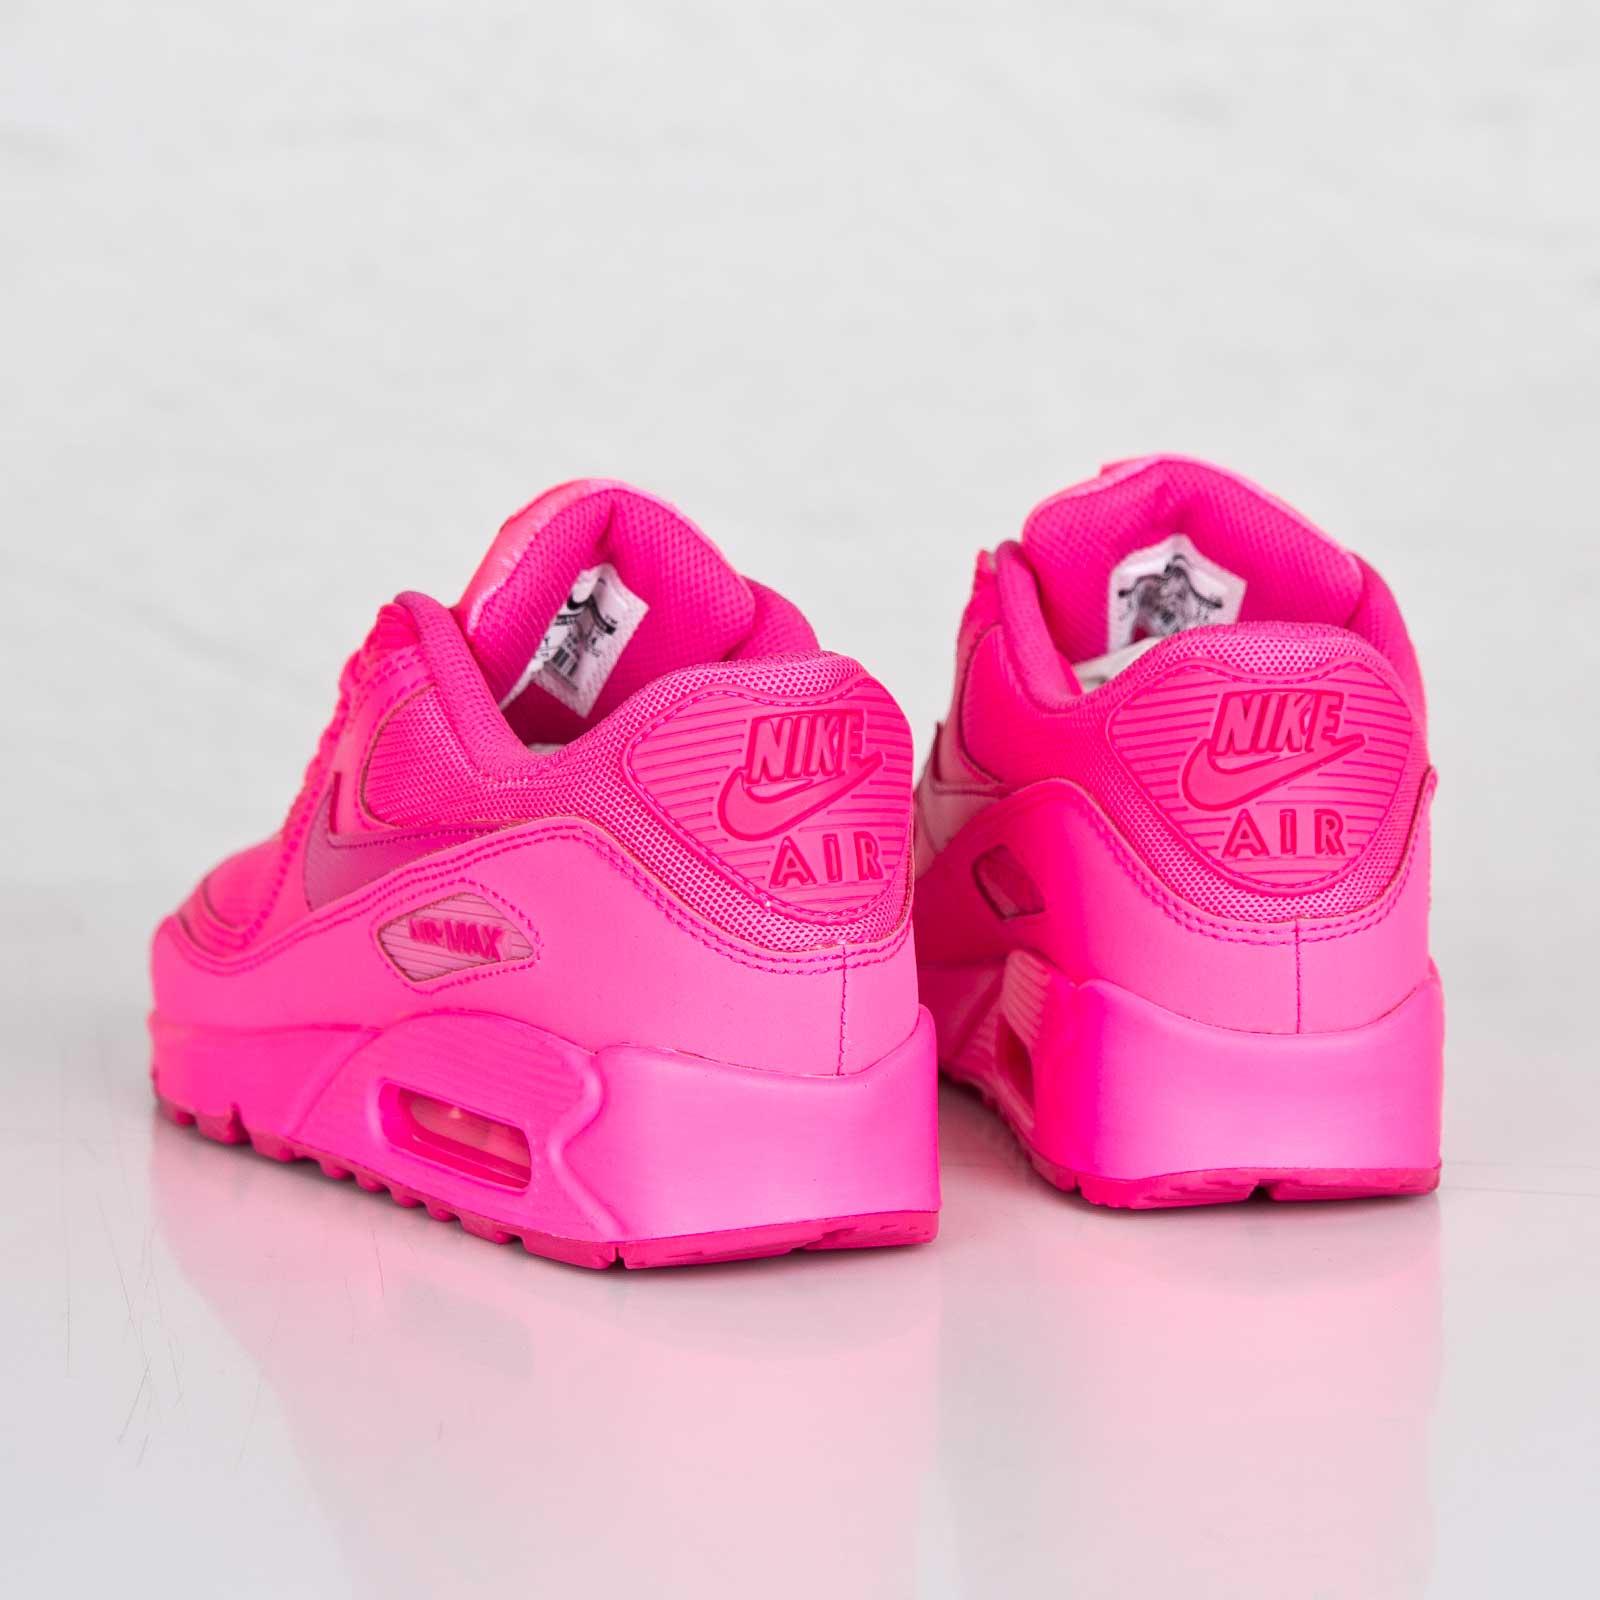 hot sale online dc82f 704db Nike Air Max 90 2007 (GS) - 345017-601 - Sneakersnstuff   sneakers    streetwear online since 1999